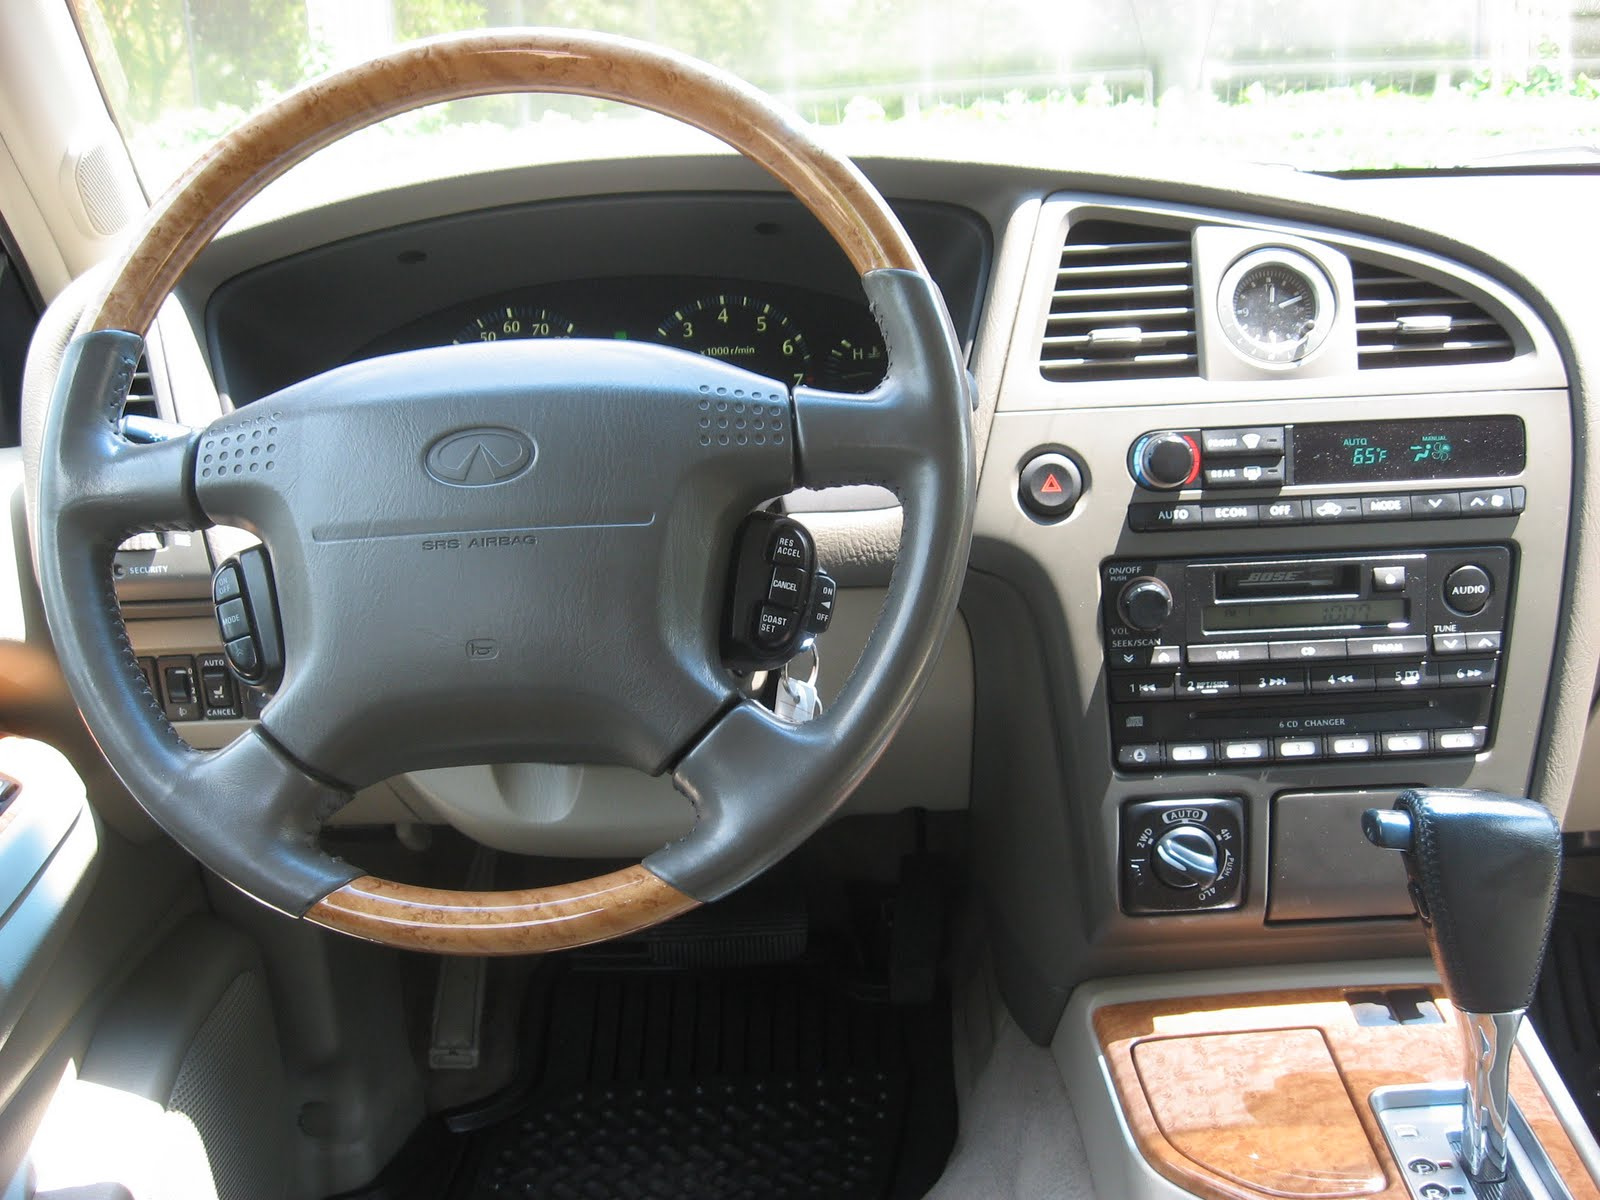 Infiniti I I 1995 - 1999 Sedan #6